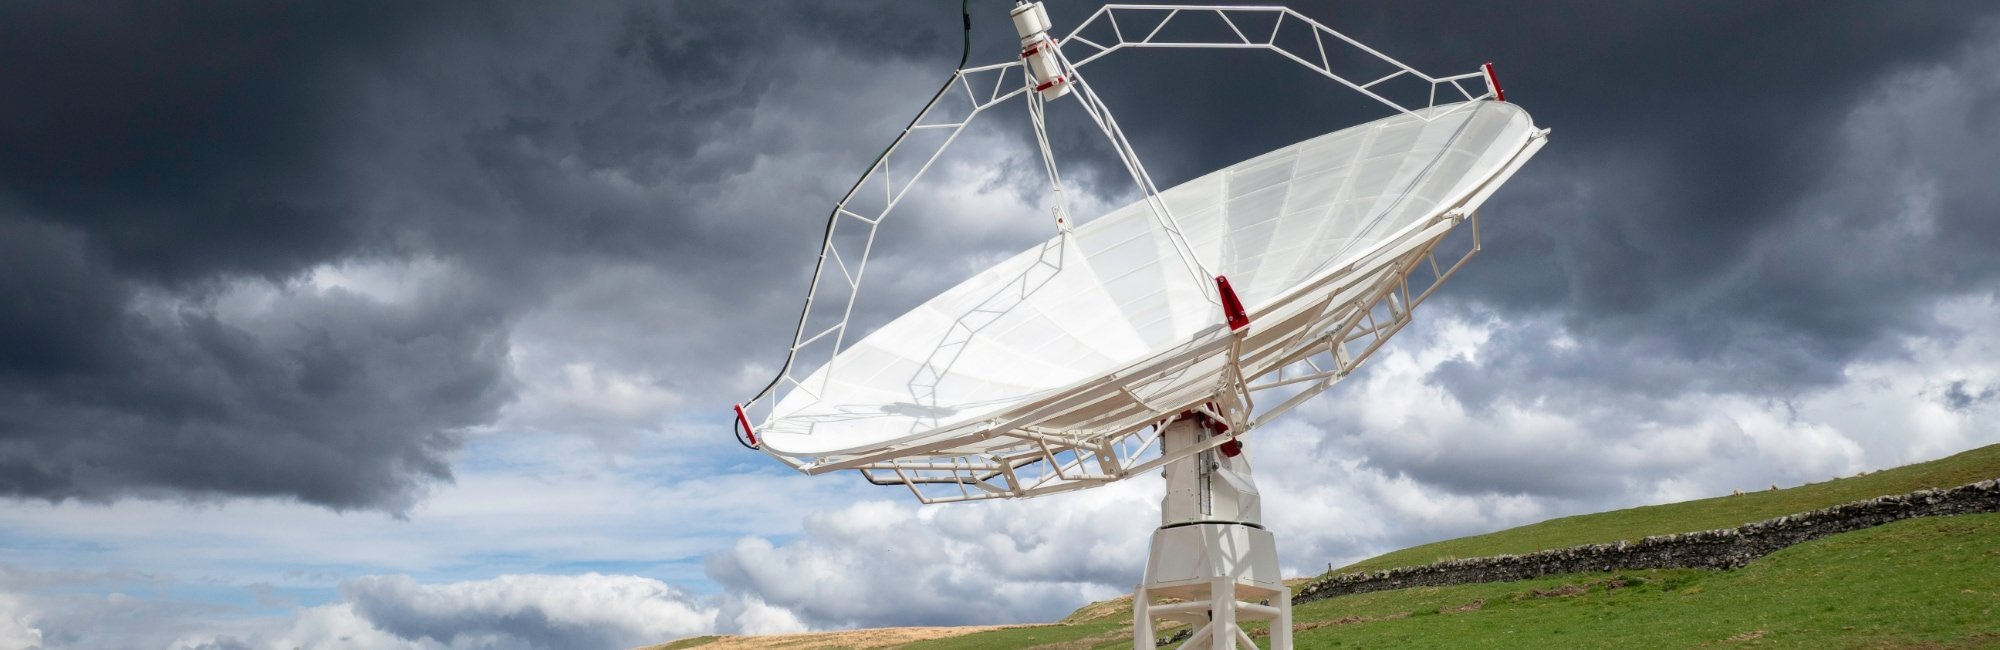 SPIDER 500A 5.0 meter diameter professional radio telescope for radio astronomy